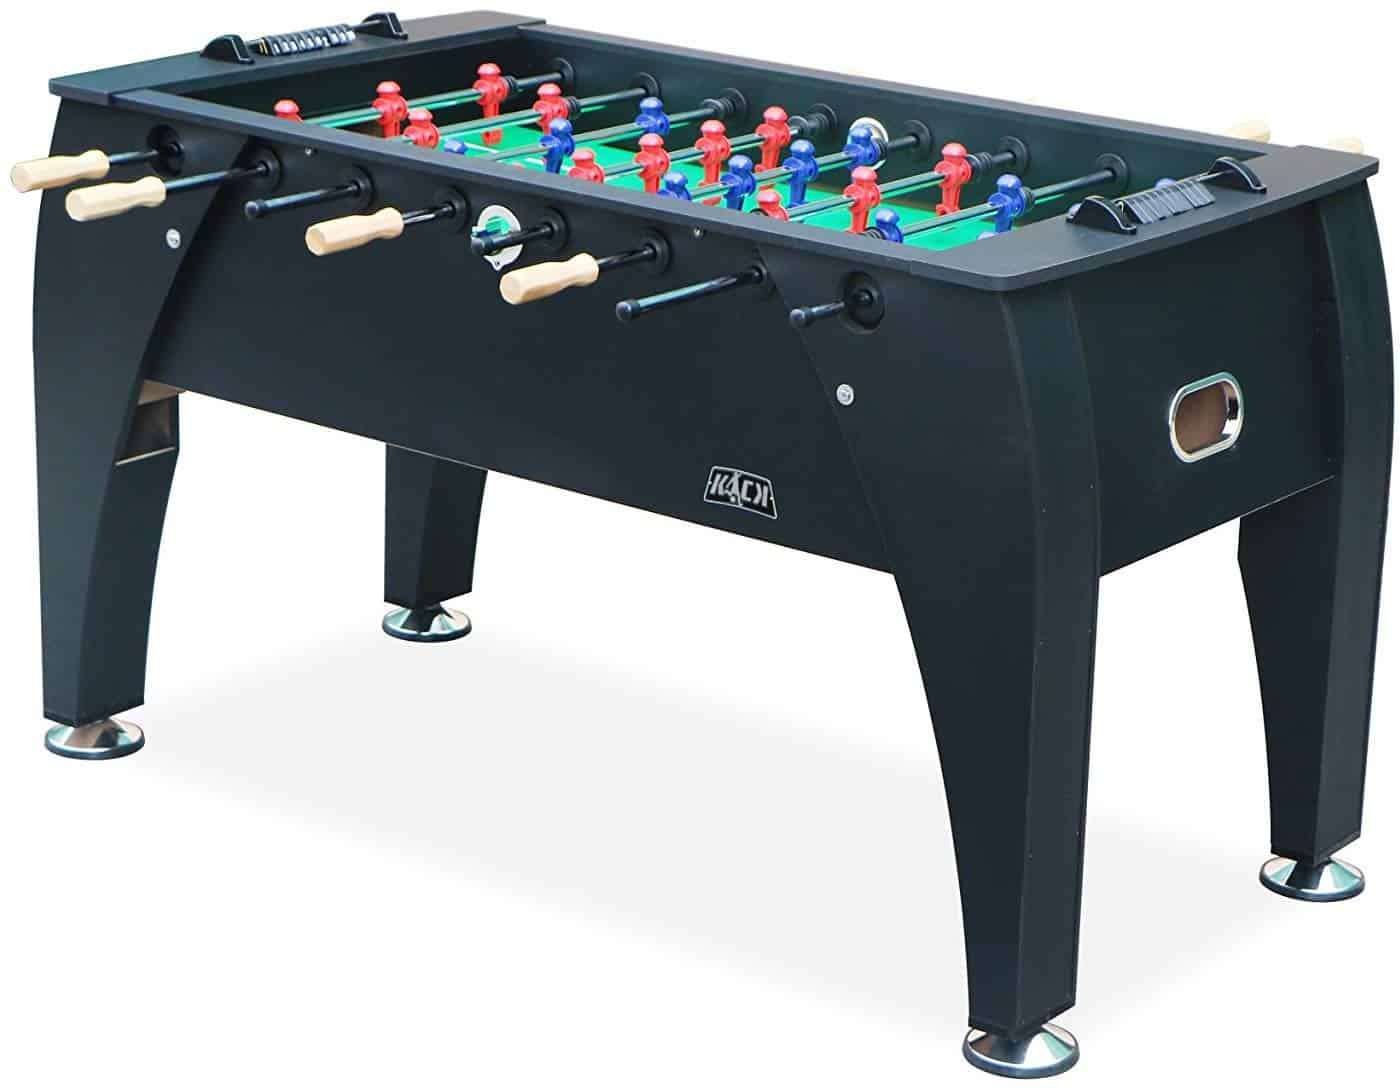 KICK Legend 55 inch Foosball Table